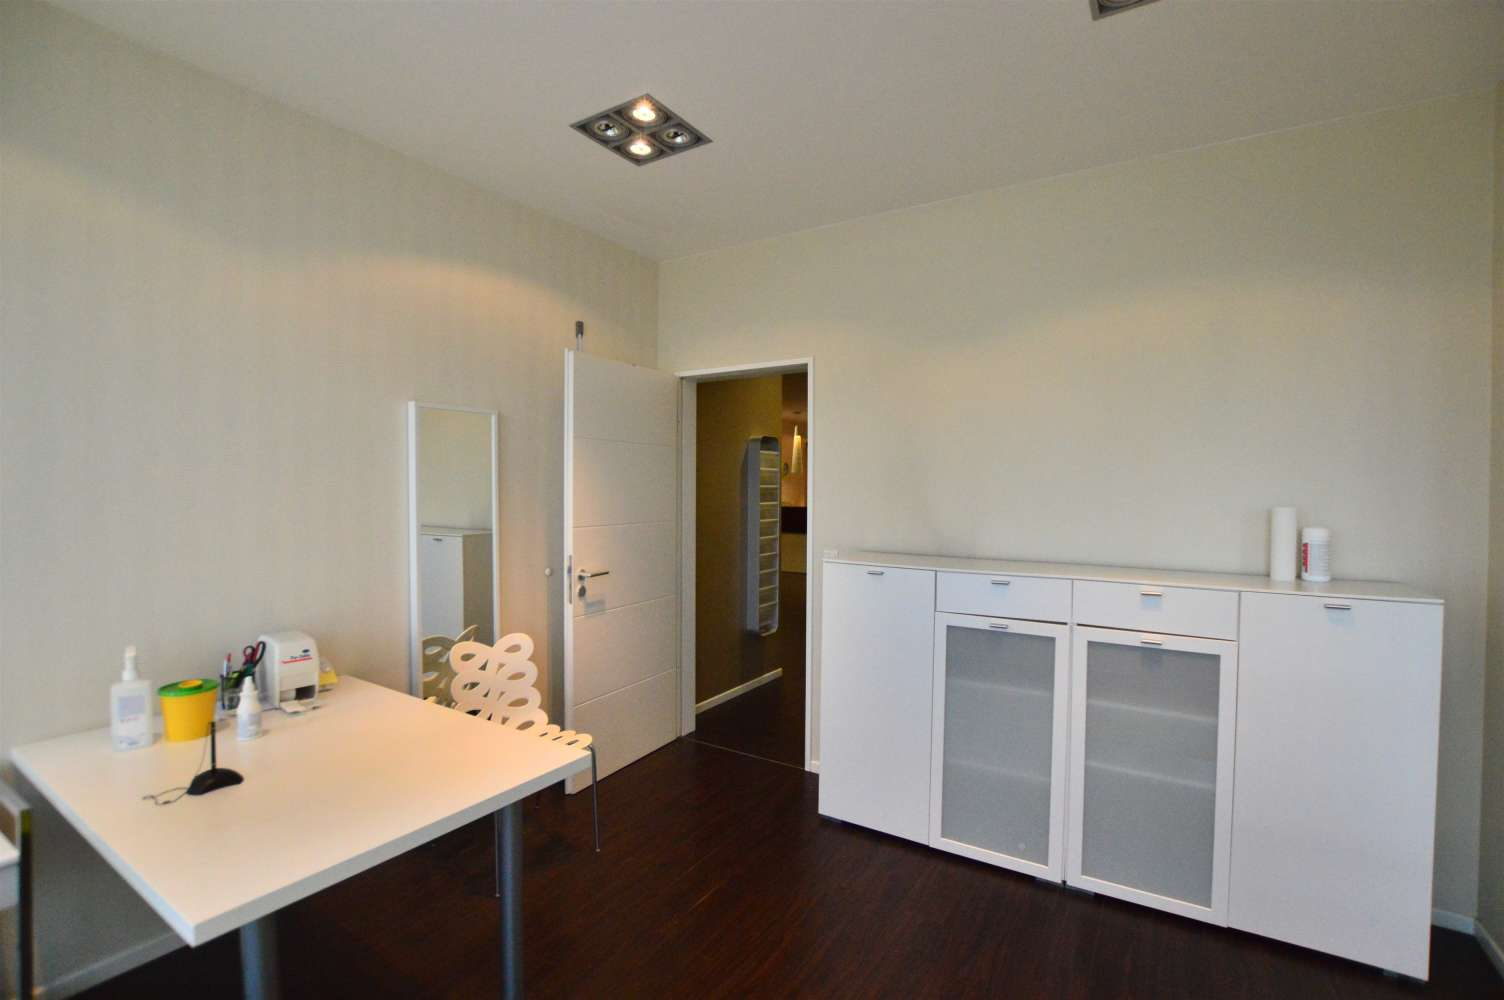 Büros Köln, 50968 - Büro - Köln, Bayenthal - K0322 - 10479017